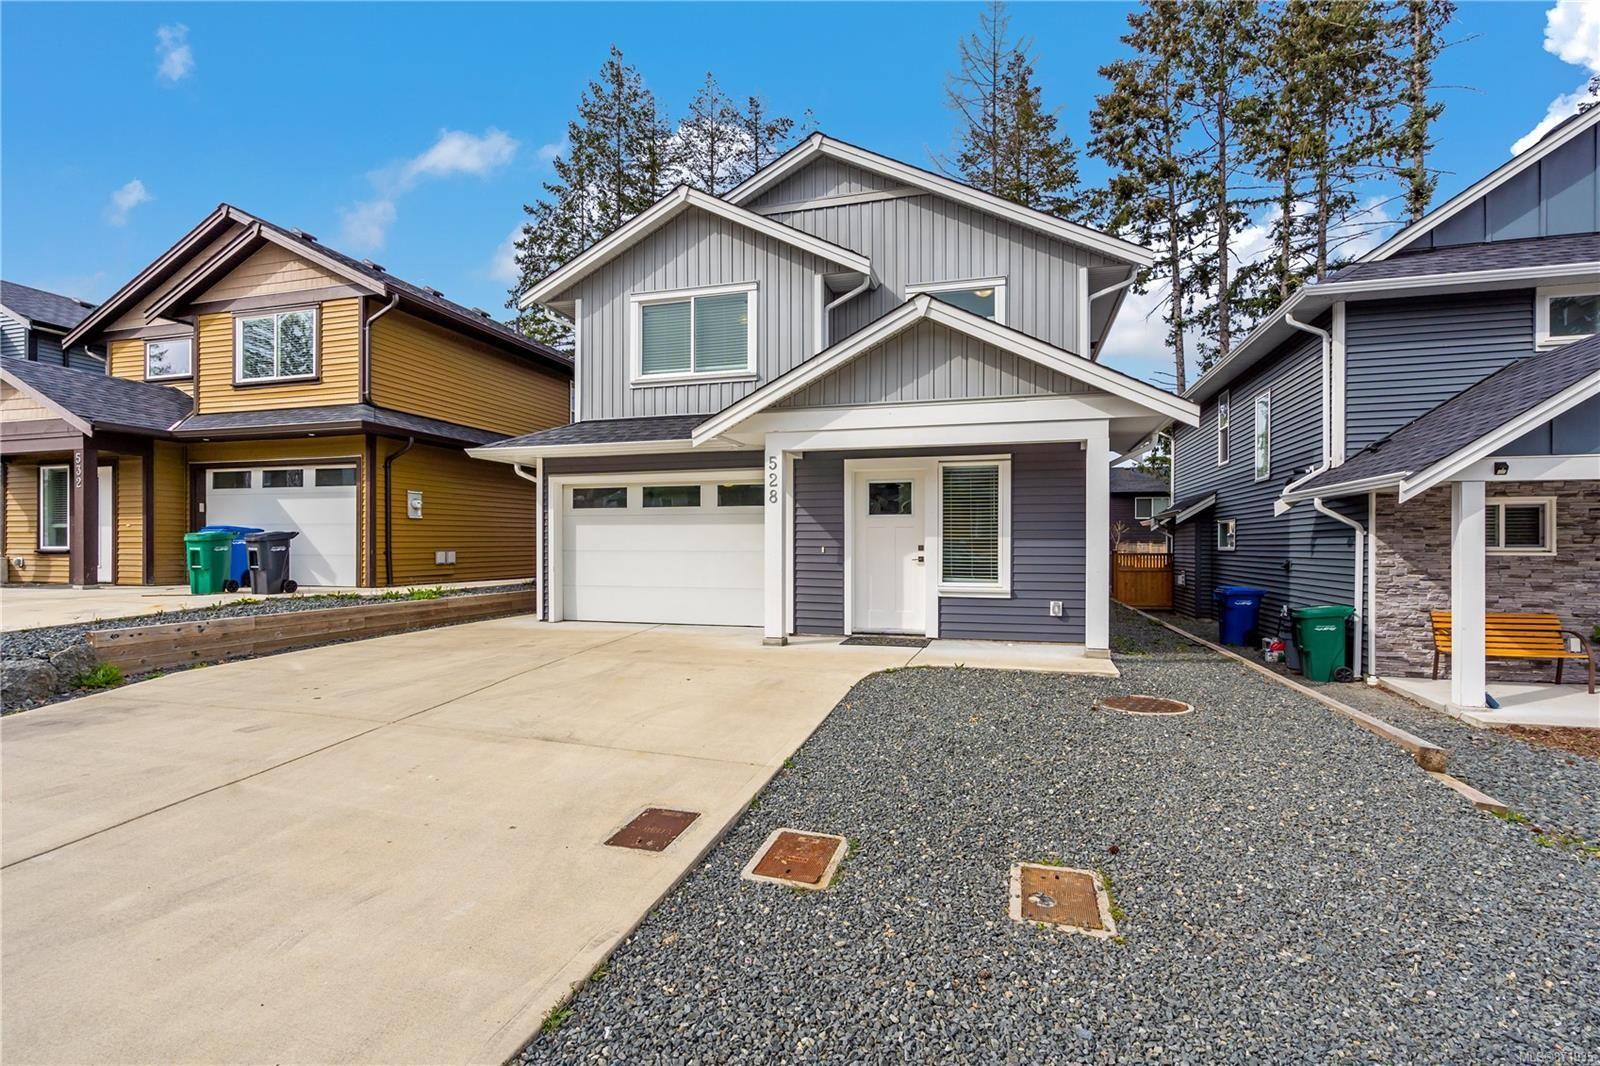 Main Photo: 528 Steeves Rd in : Na South Nanaimo House for sale (Nanaimo)  : MLS®# 871935